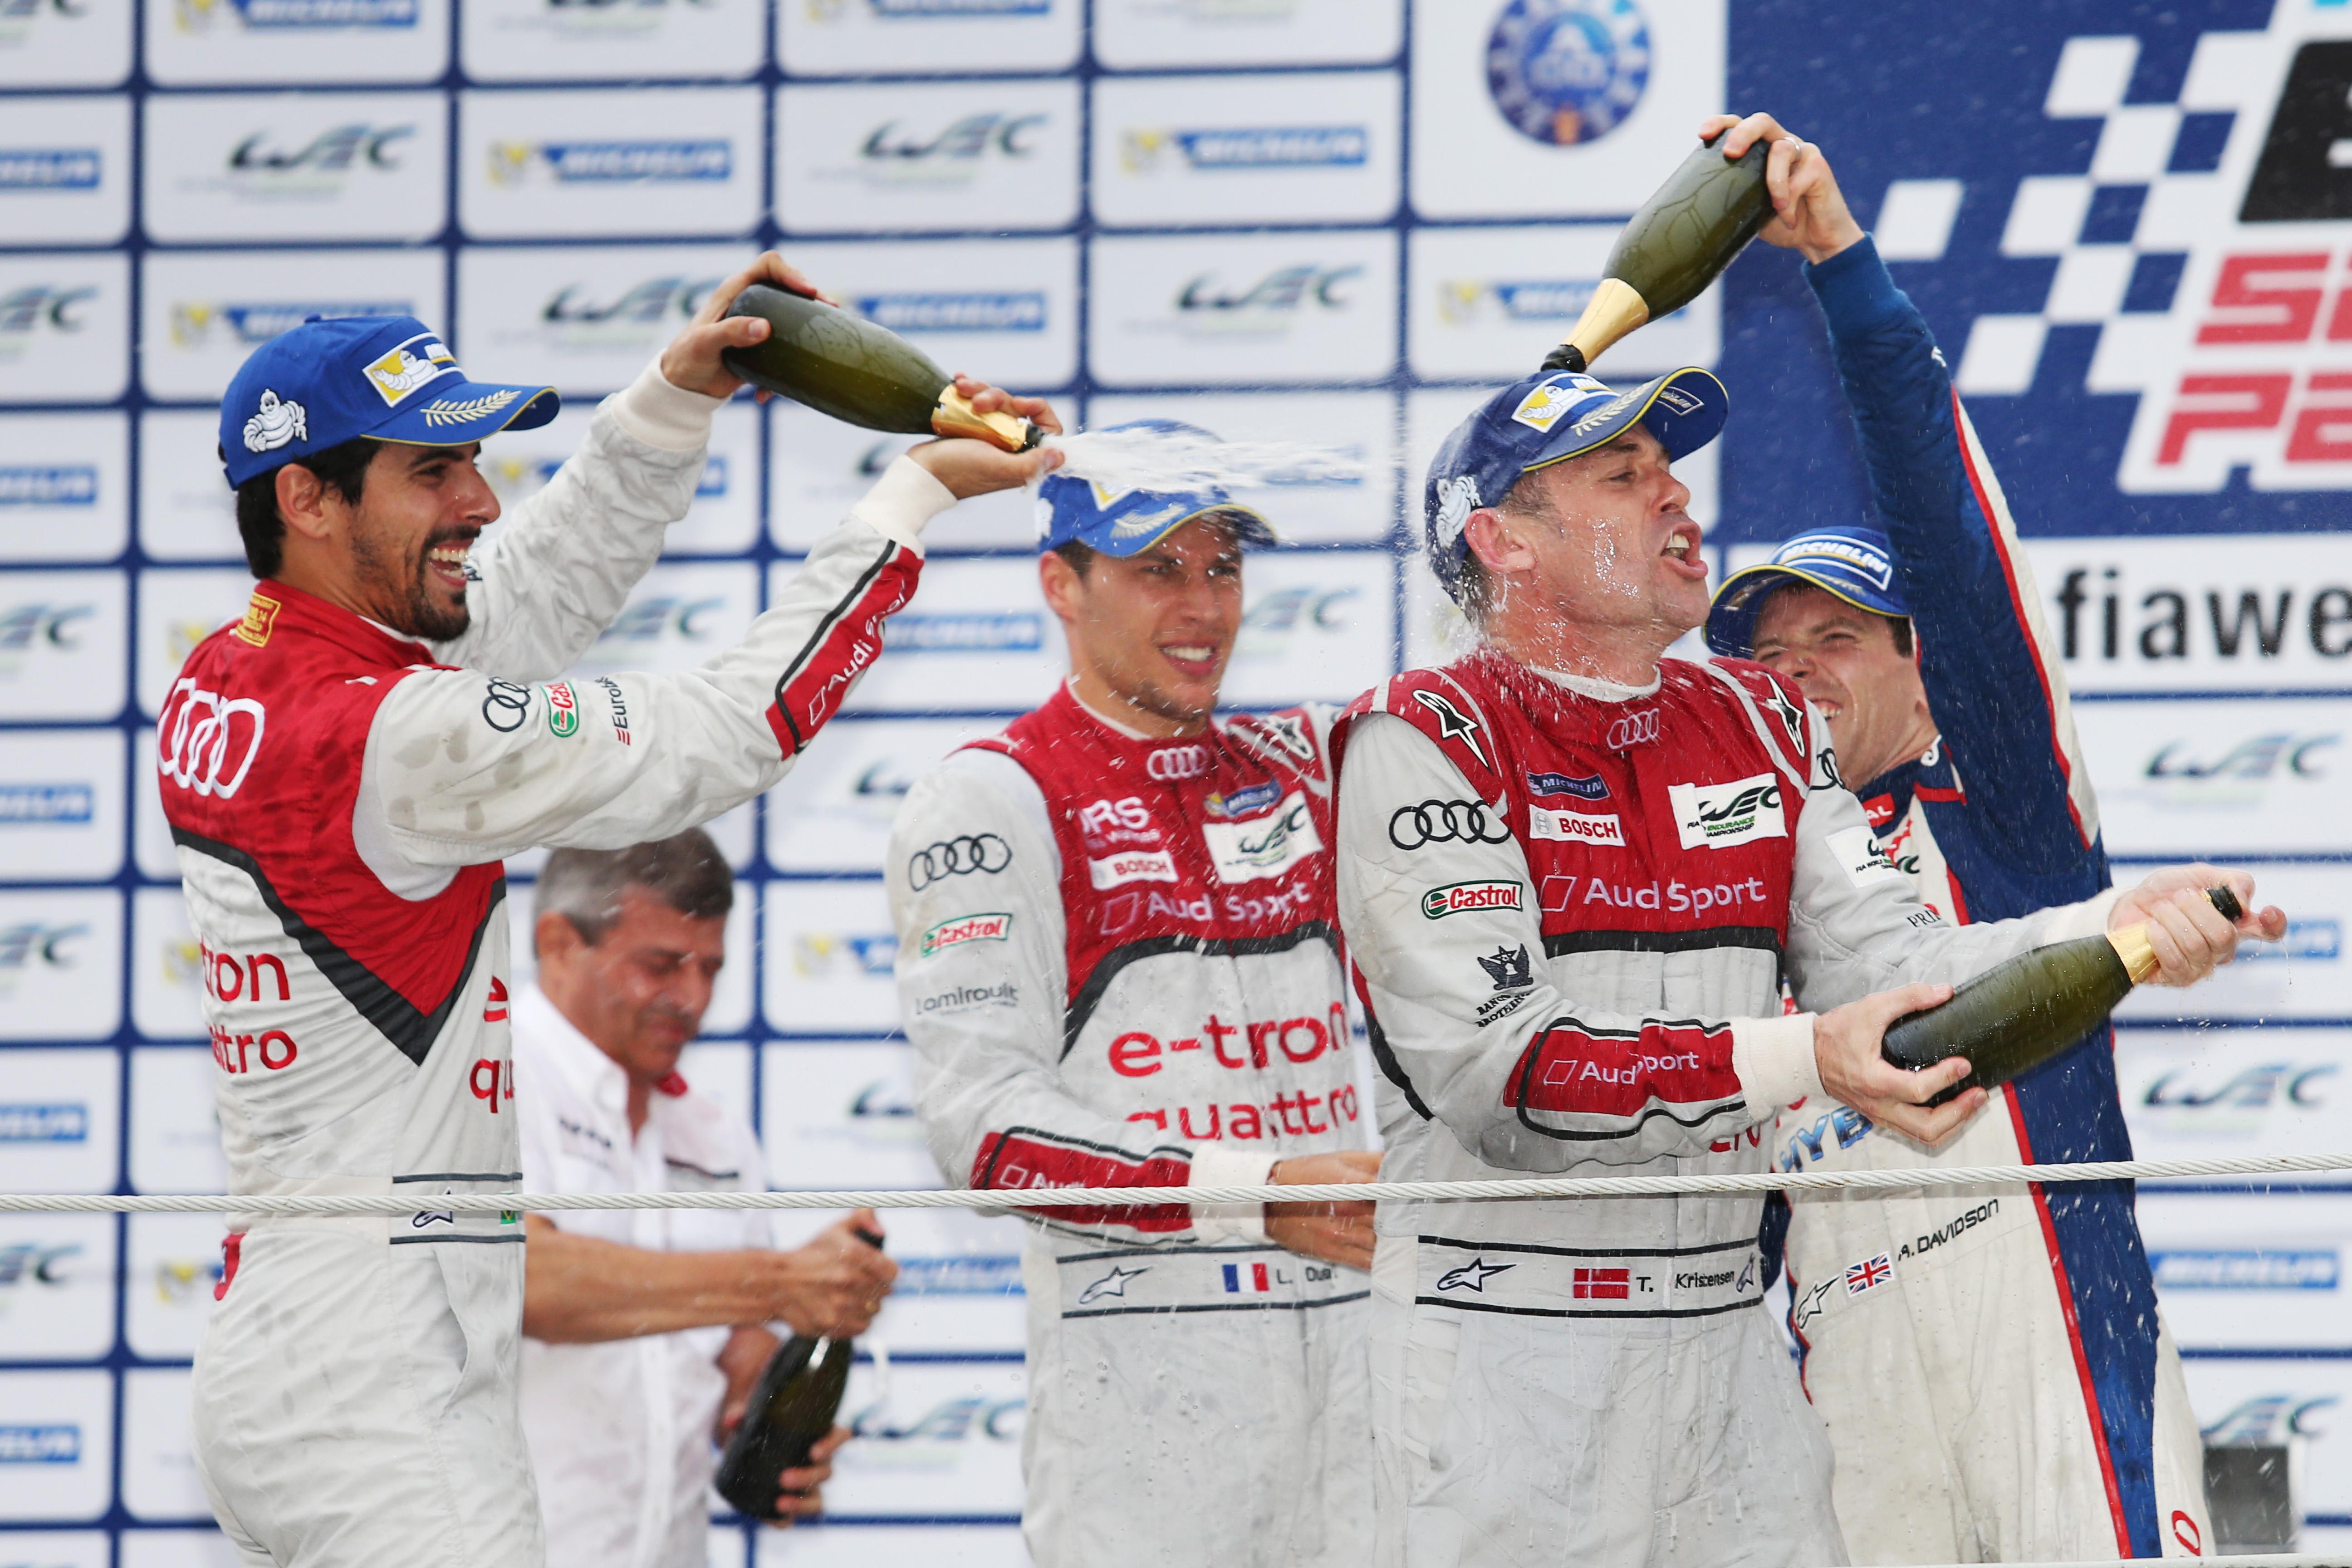 Motor Racing Fia World Endurance Championship Wec Round 8 Sao Paulo, Brazil